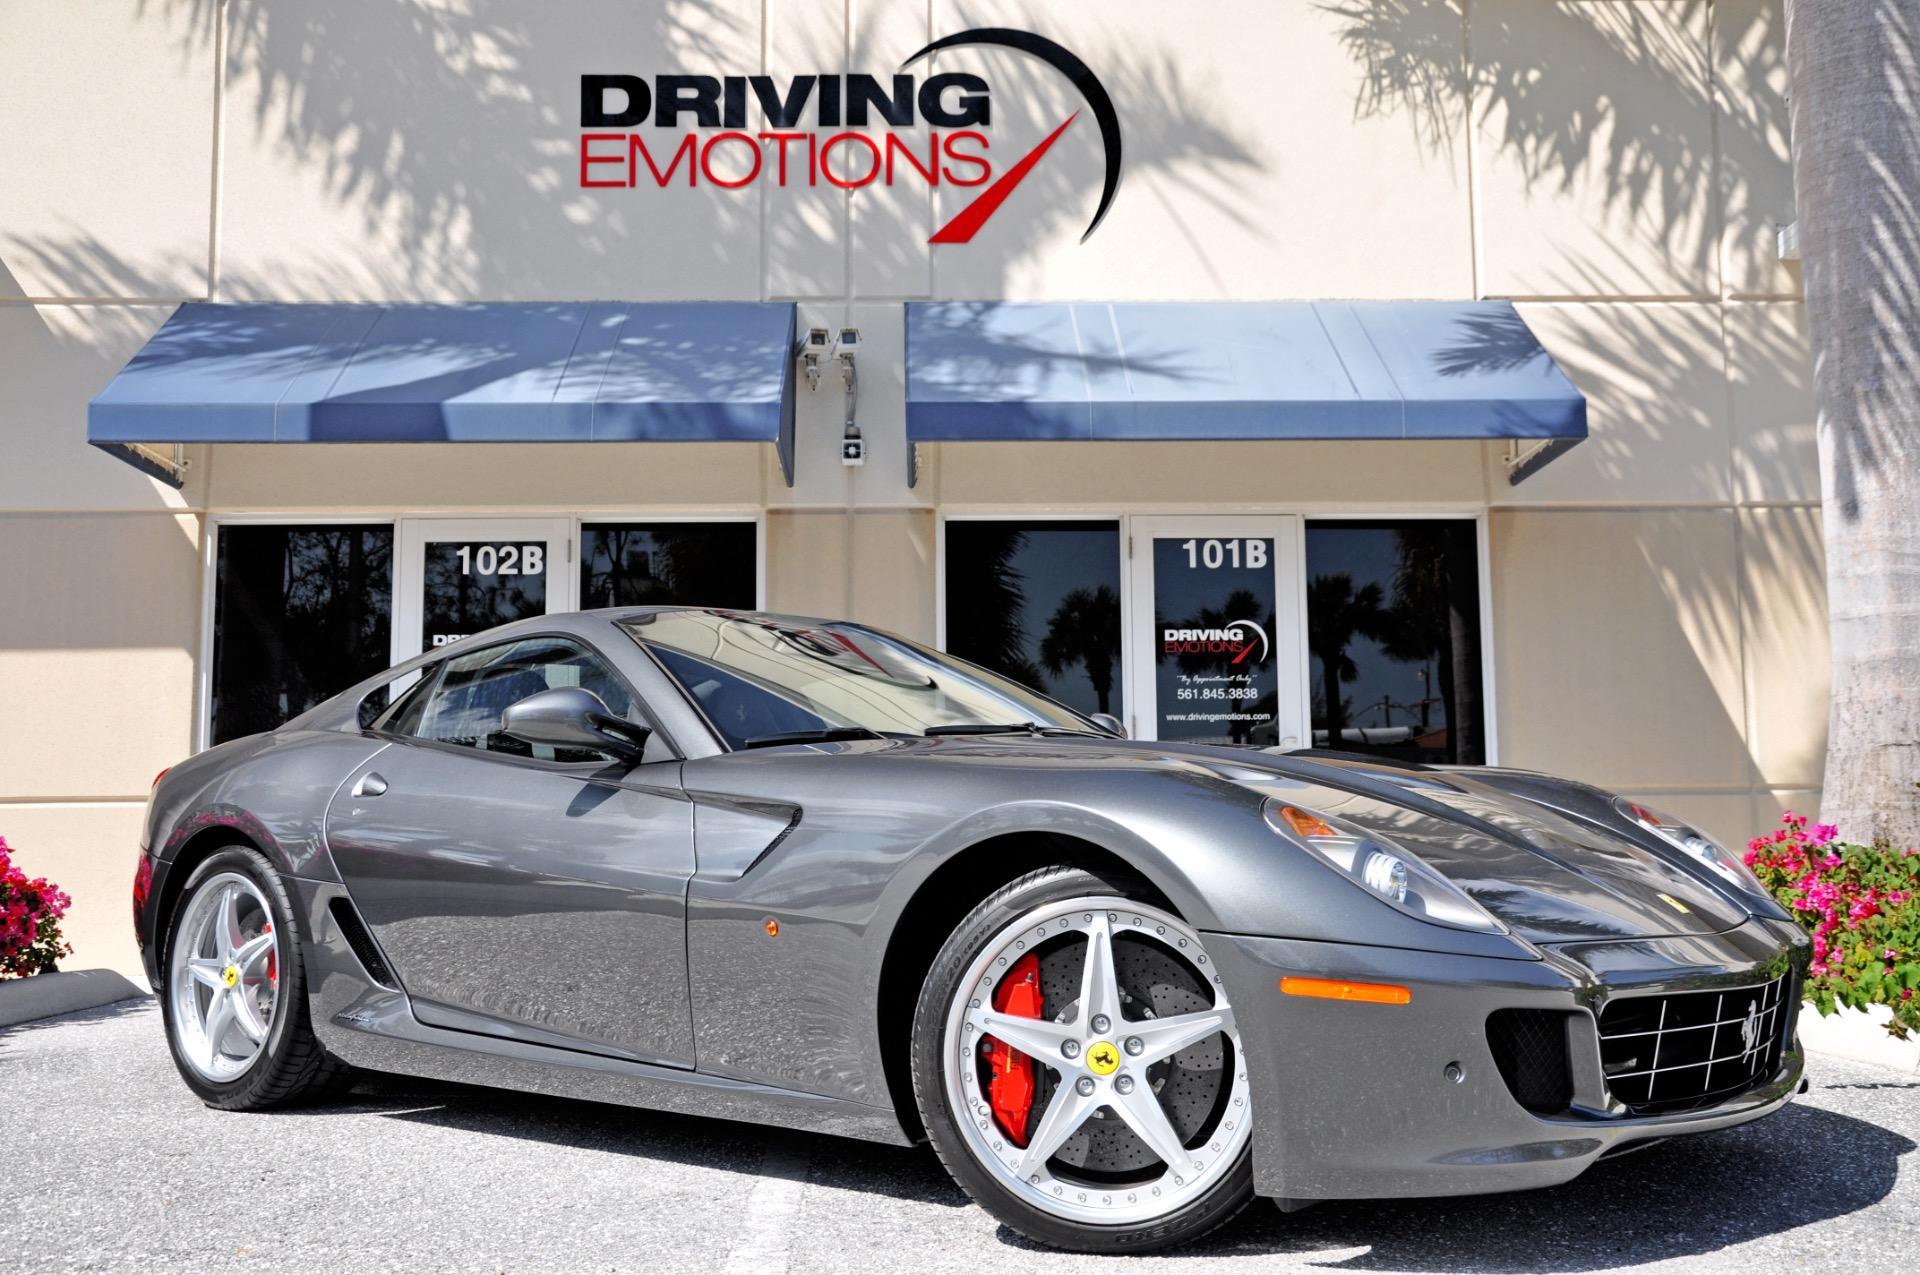 2011 Ferrari 599 Gtb Fiorano F1 Hgte Stock 5933 For Sale Near Lake Park Fl Fl Ferrari Dealer